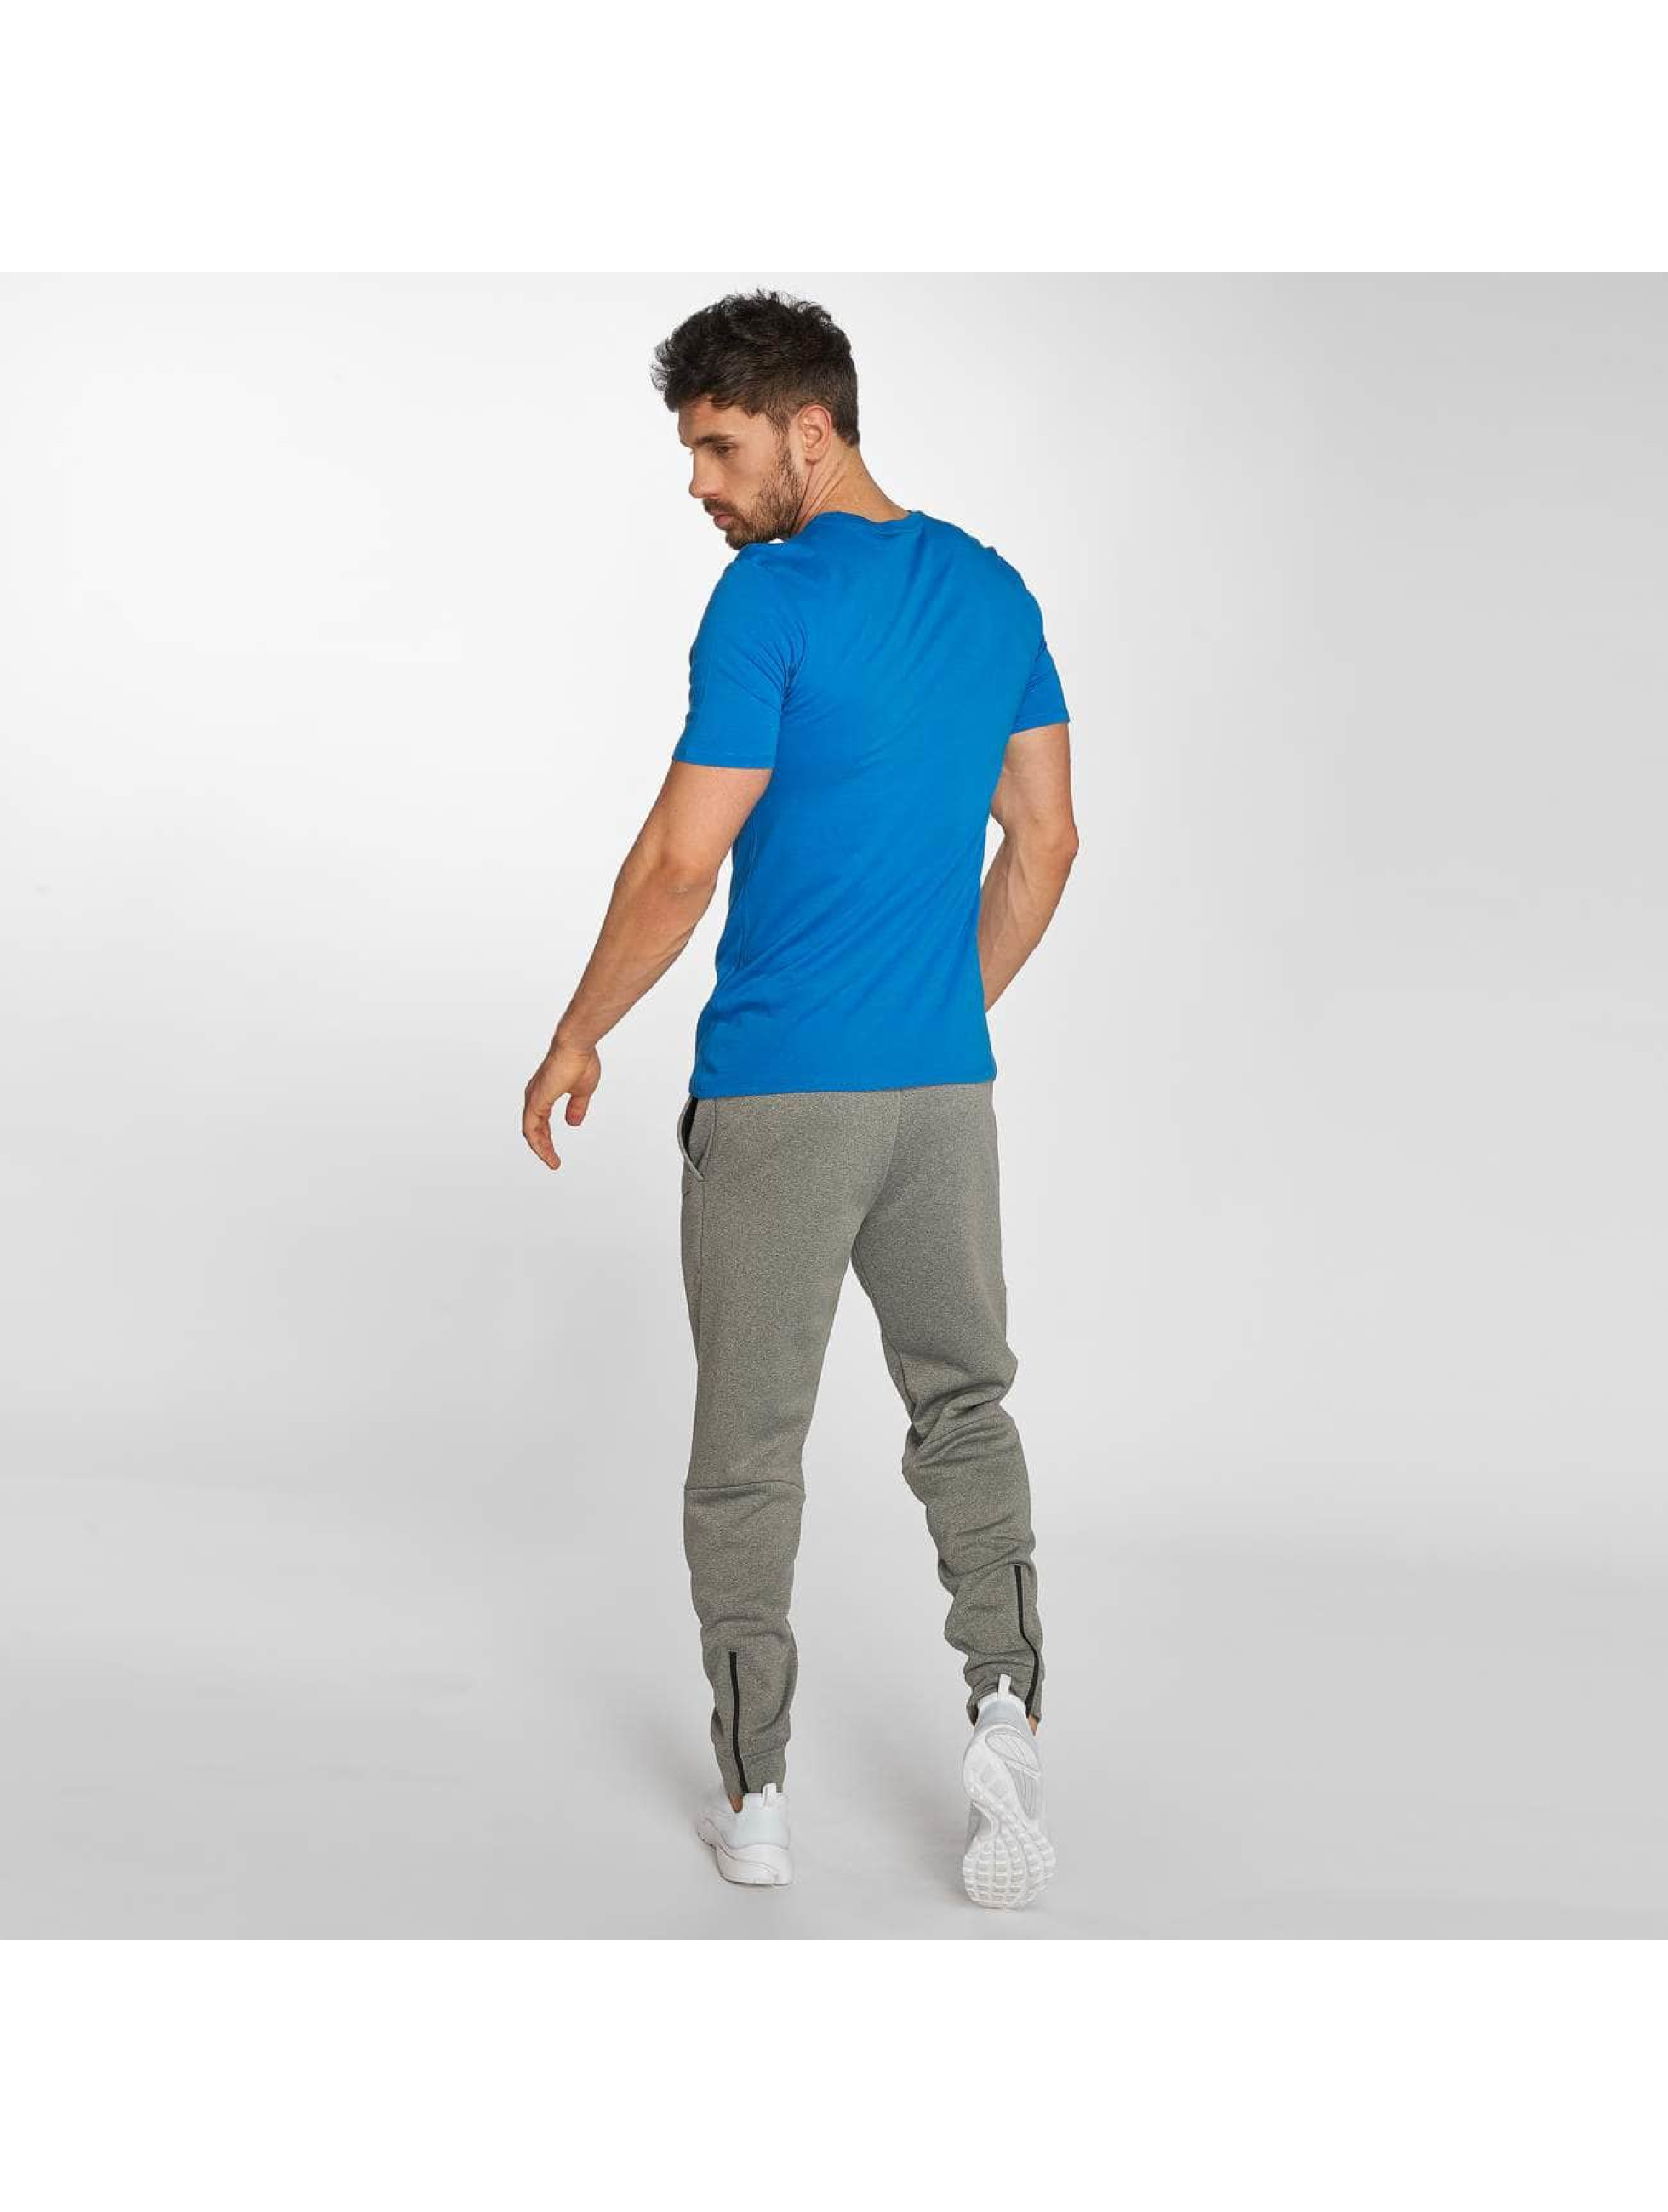 Nike Performance Sweat Pant Therma Sphere gray